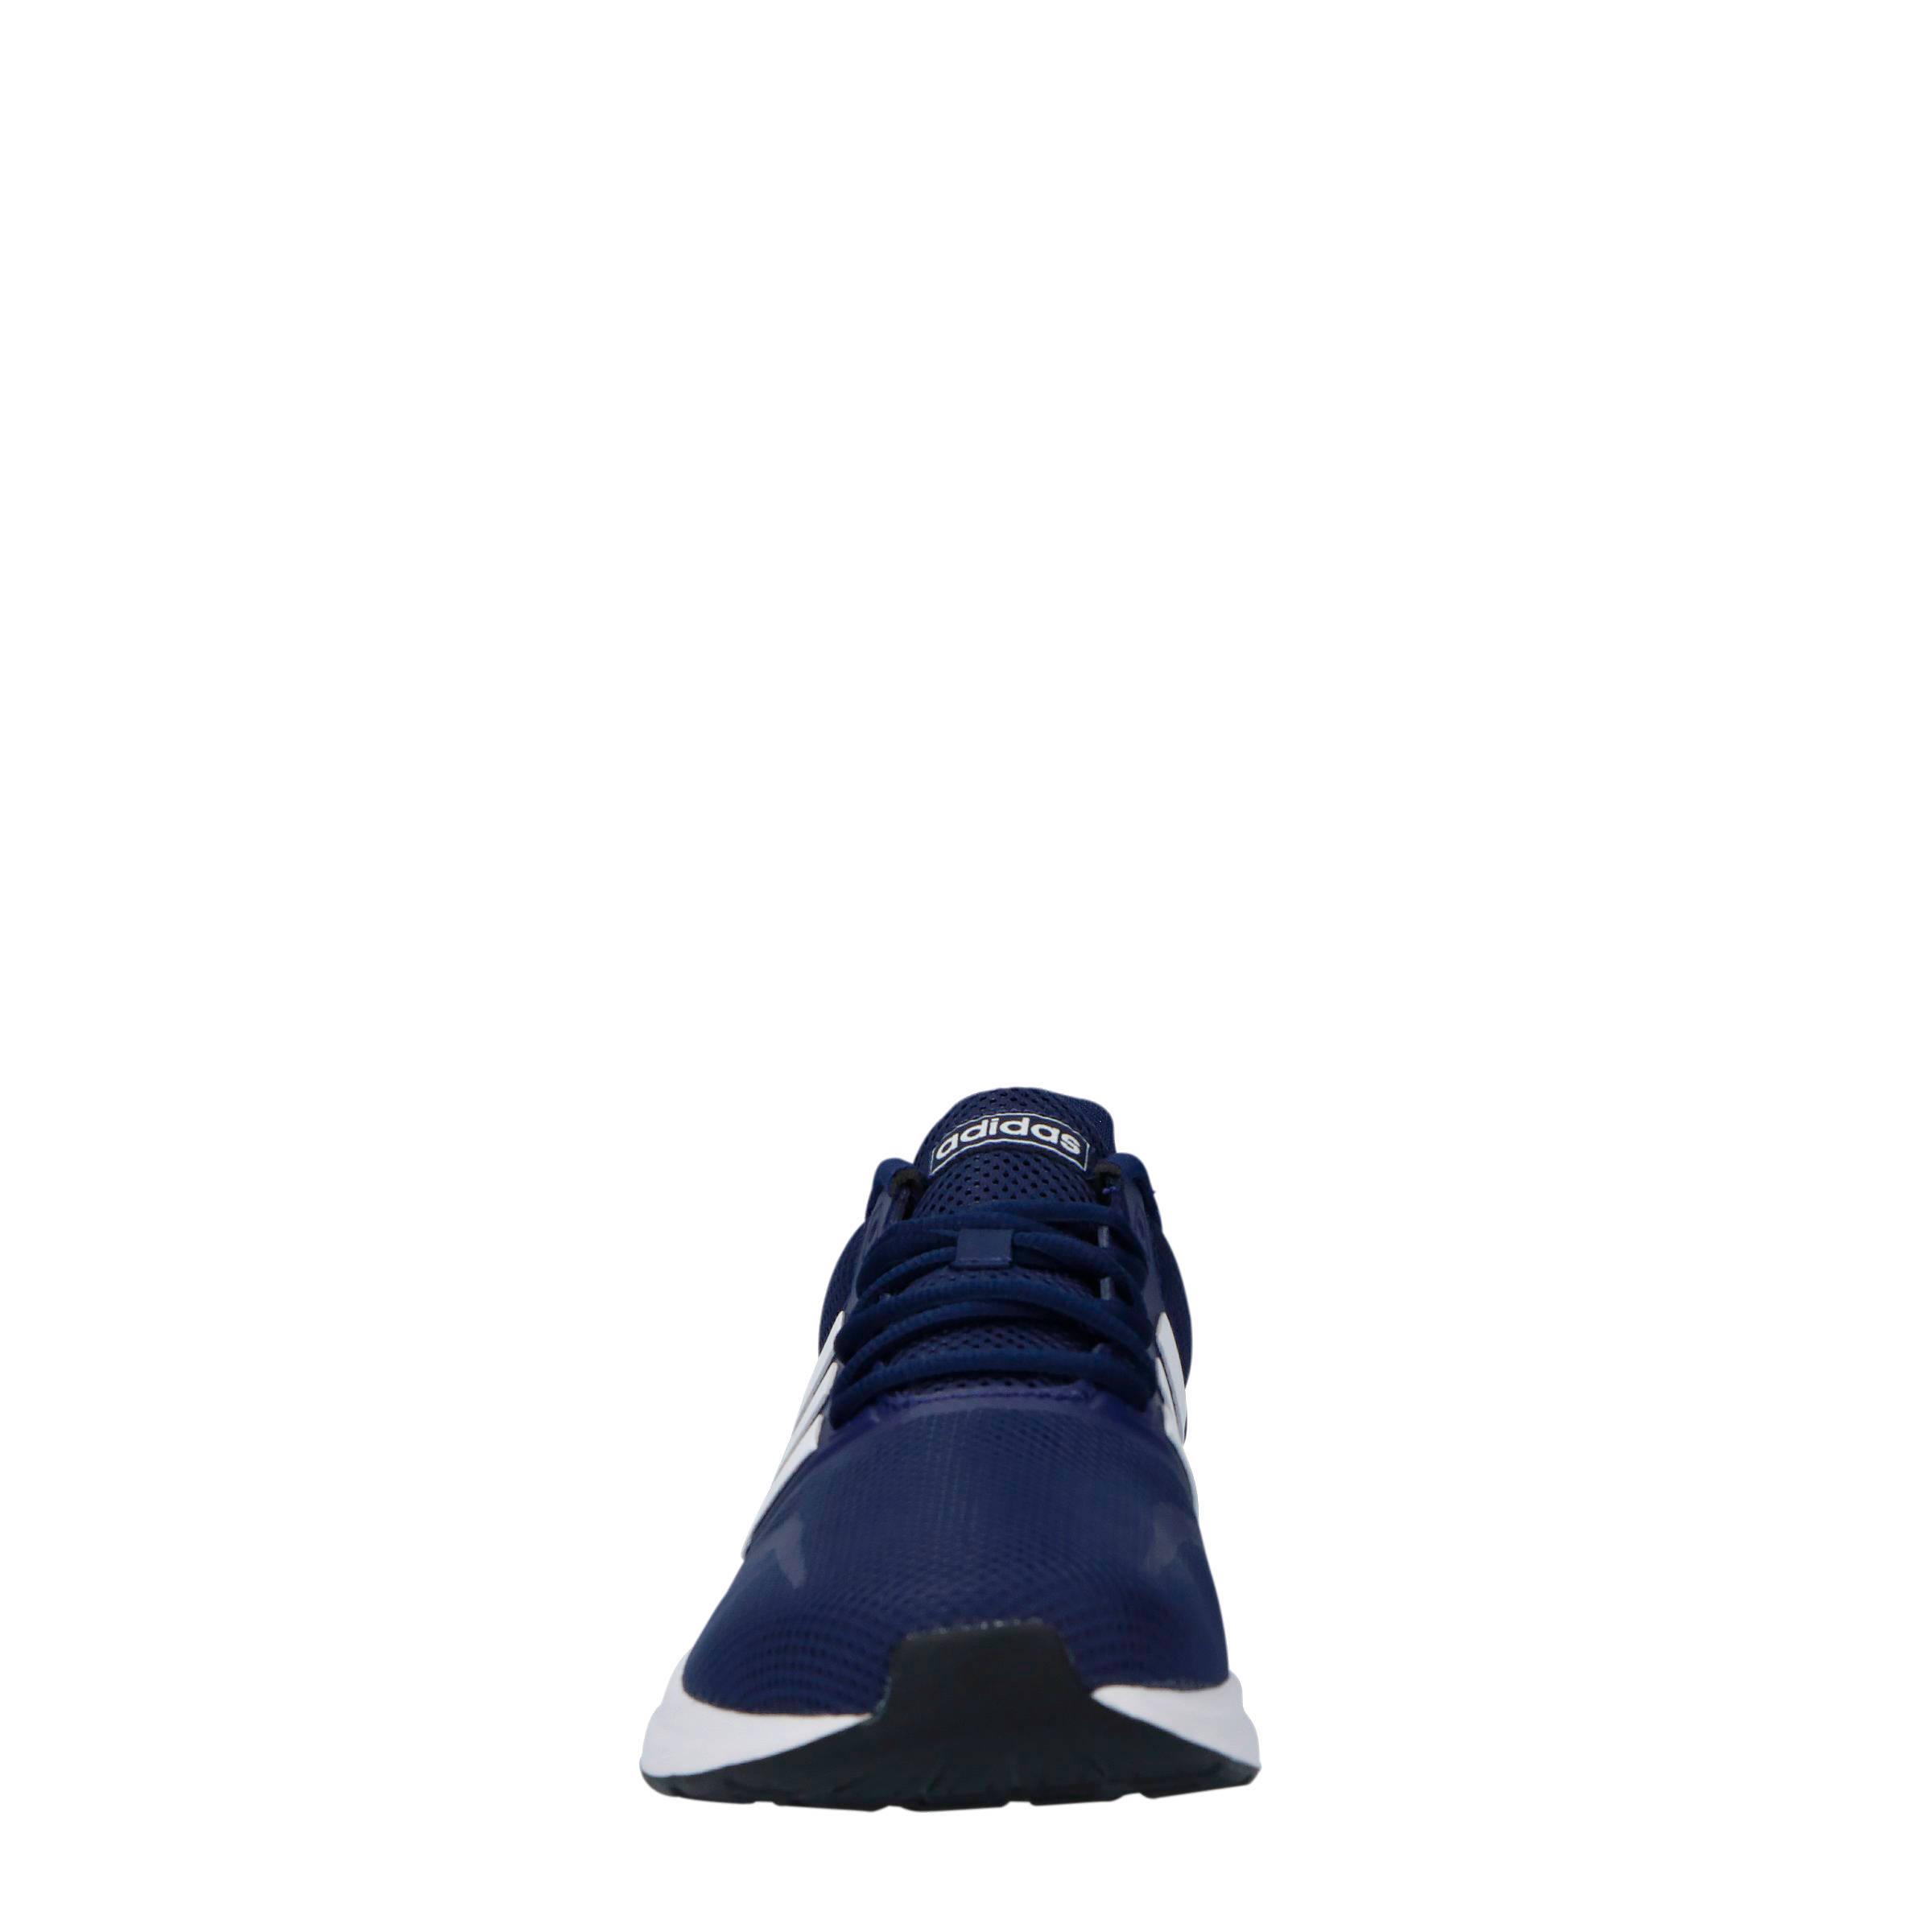 adidas Performance Runfalcon hardloopschoenen blauwwit